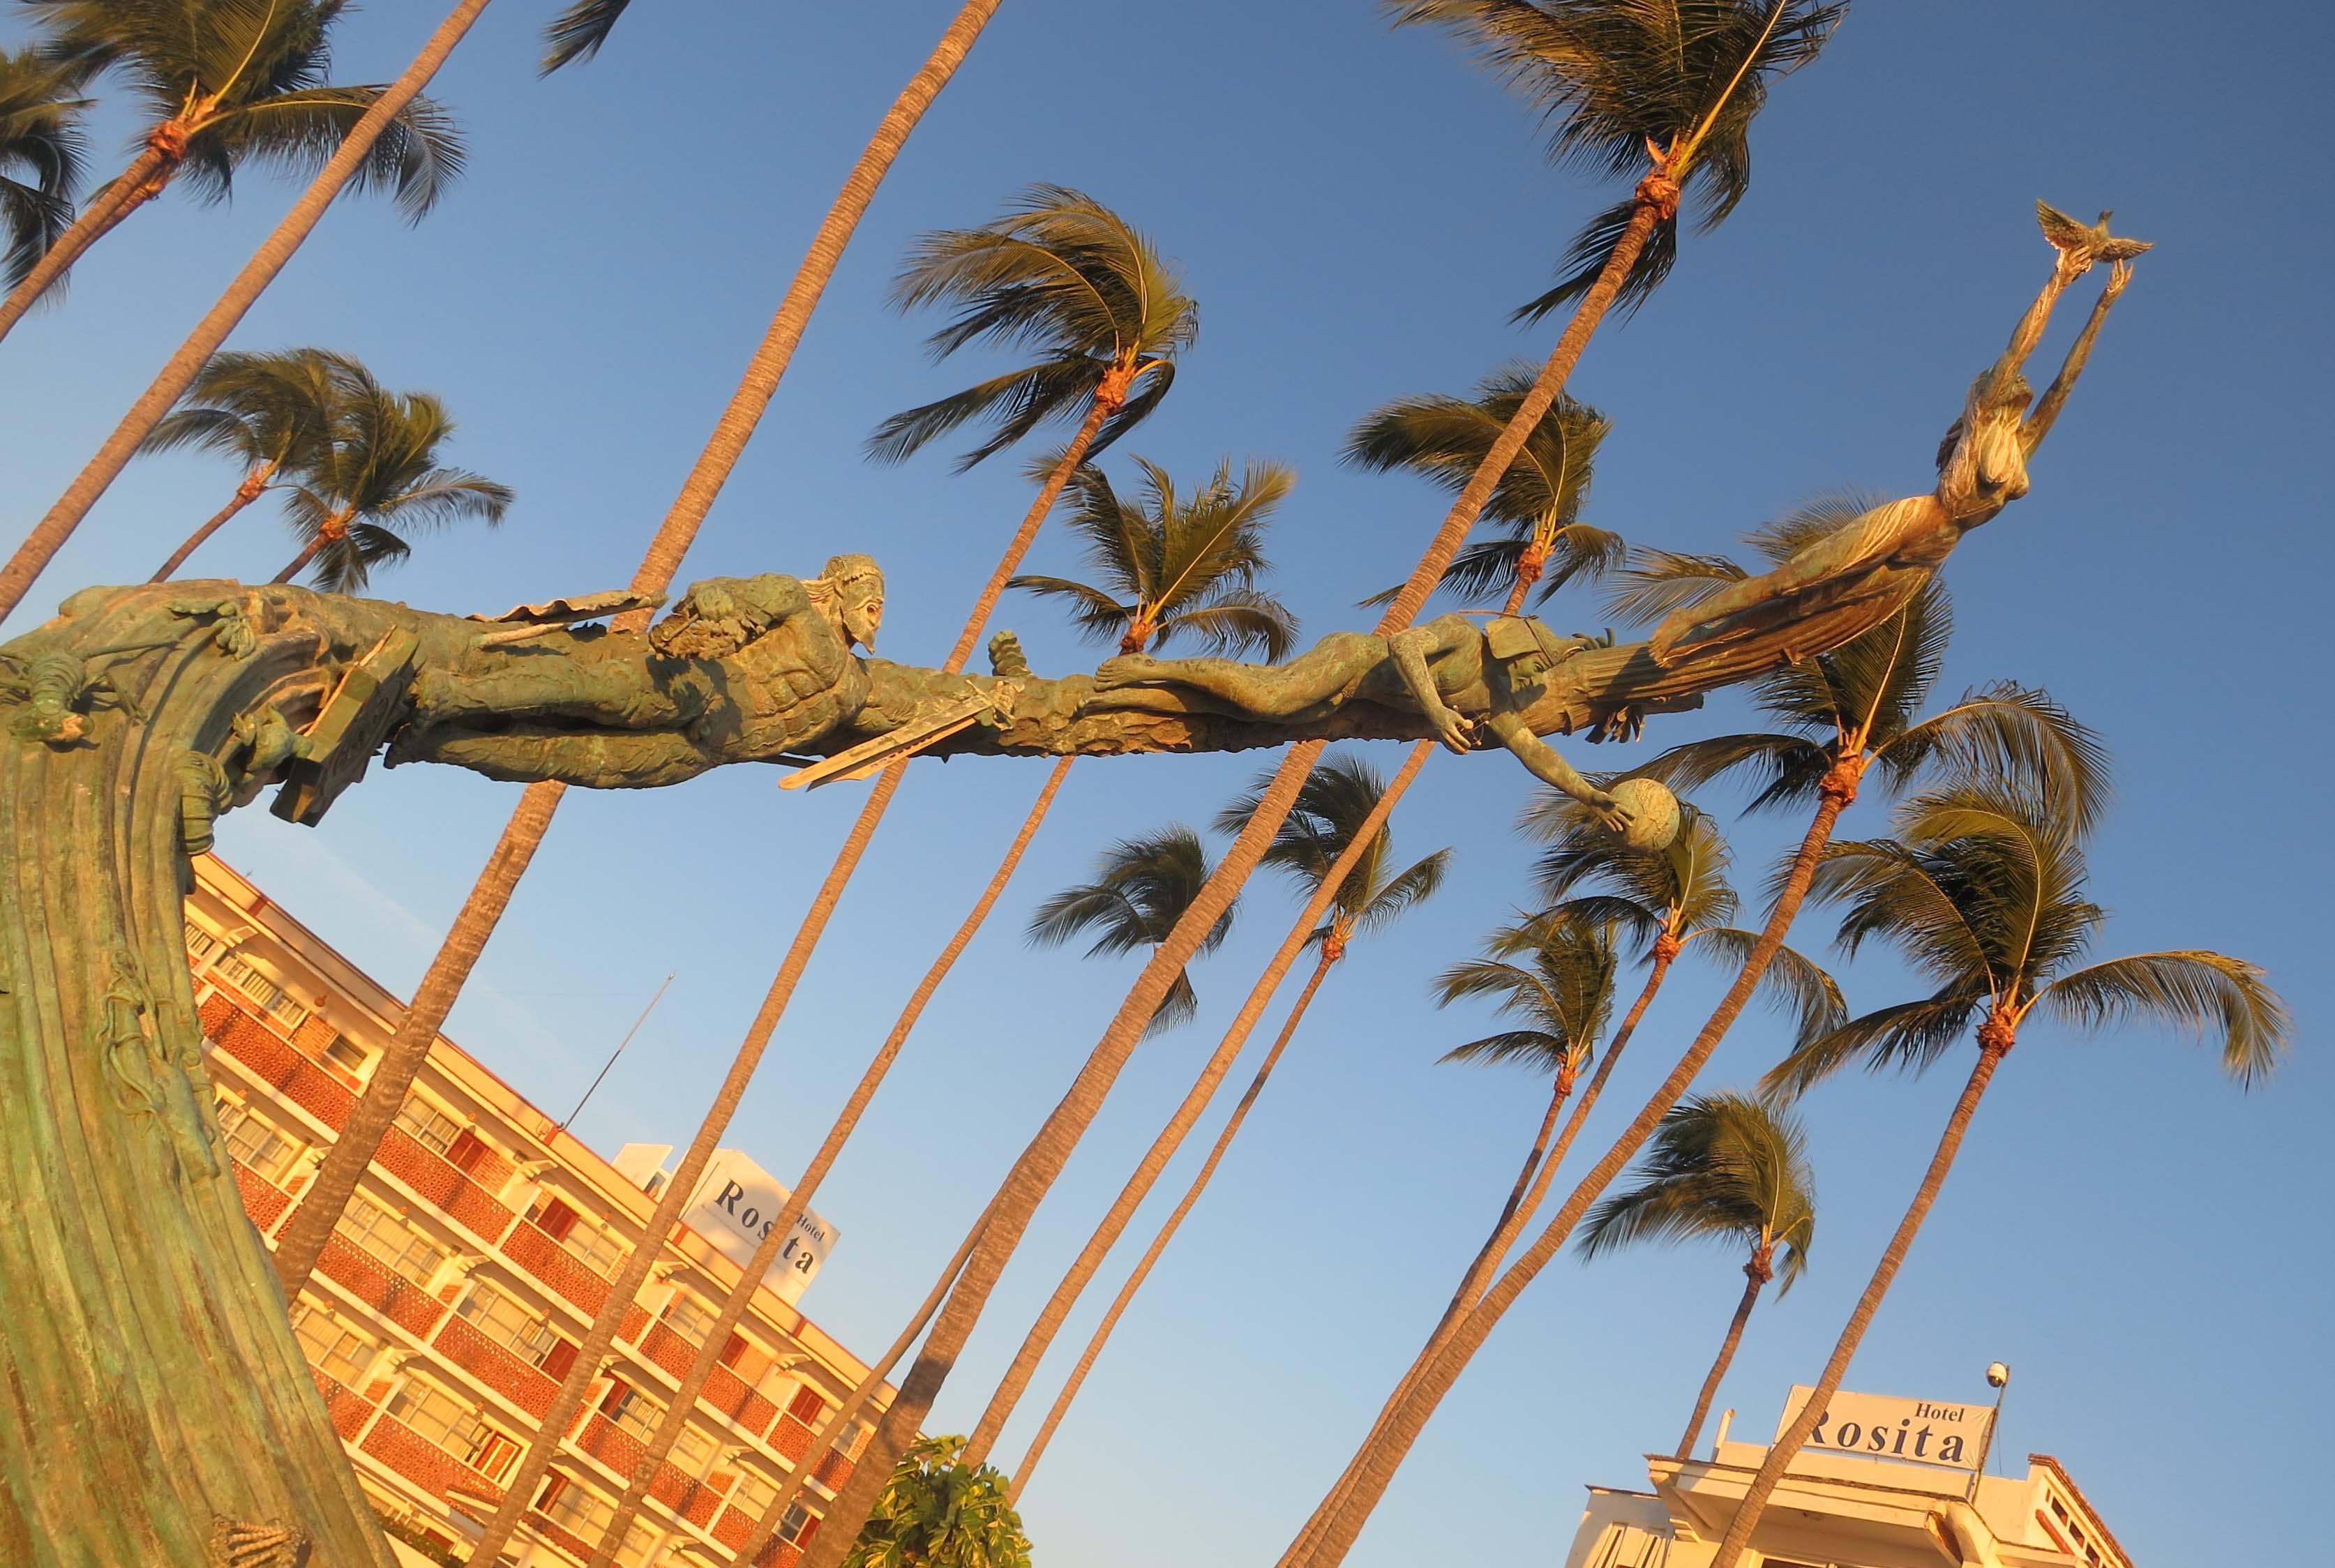 Photo of Puerto Vallarta Millennia sculpture by Curtis Mekemson.